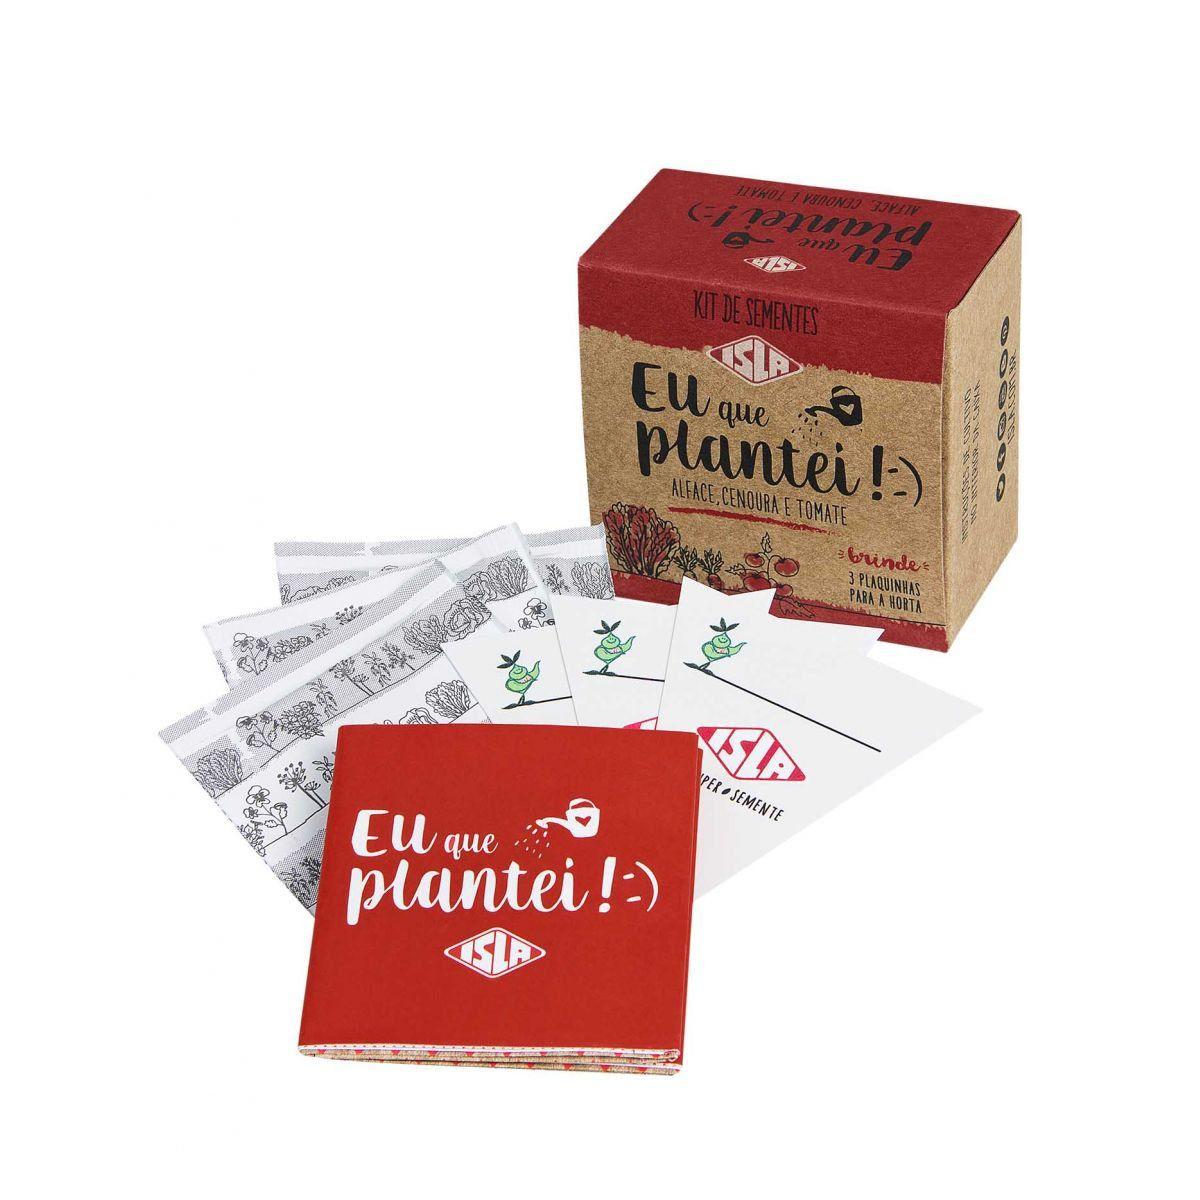 "Kit de Sementes ""Eu Que Plantei"" (Alface, Tomate e Cenoura)"